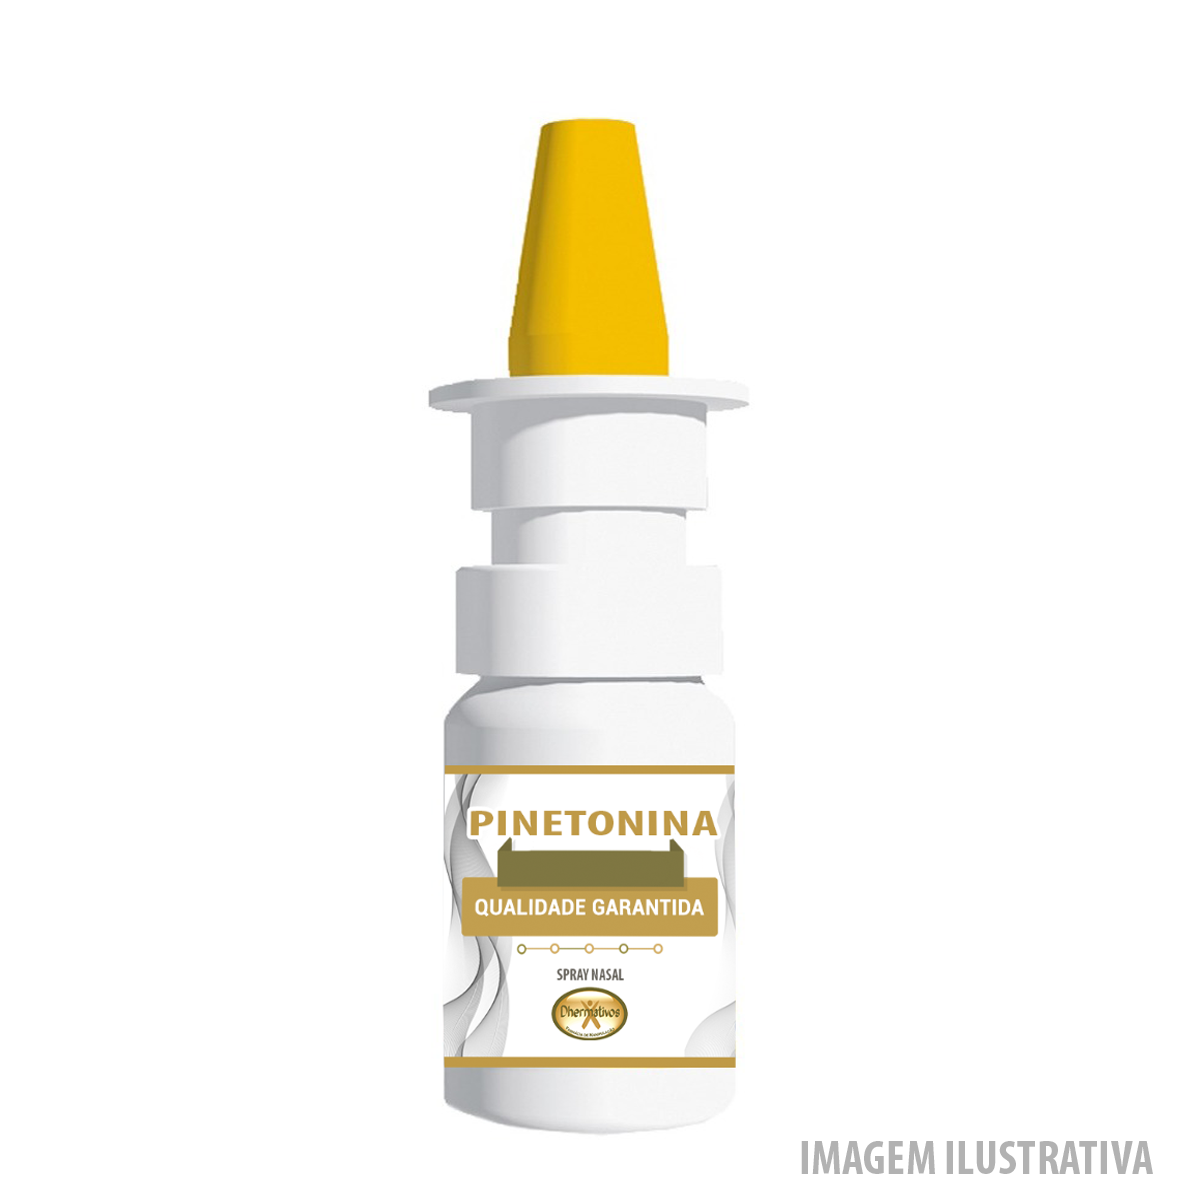 Pinetonina 30% Spray Nasal 20ml